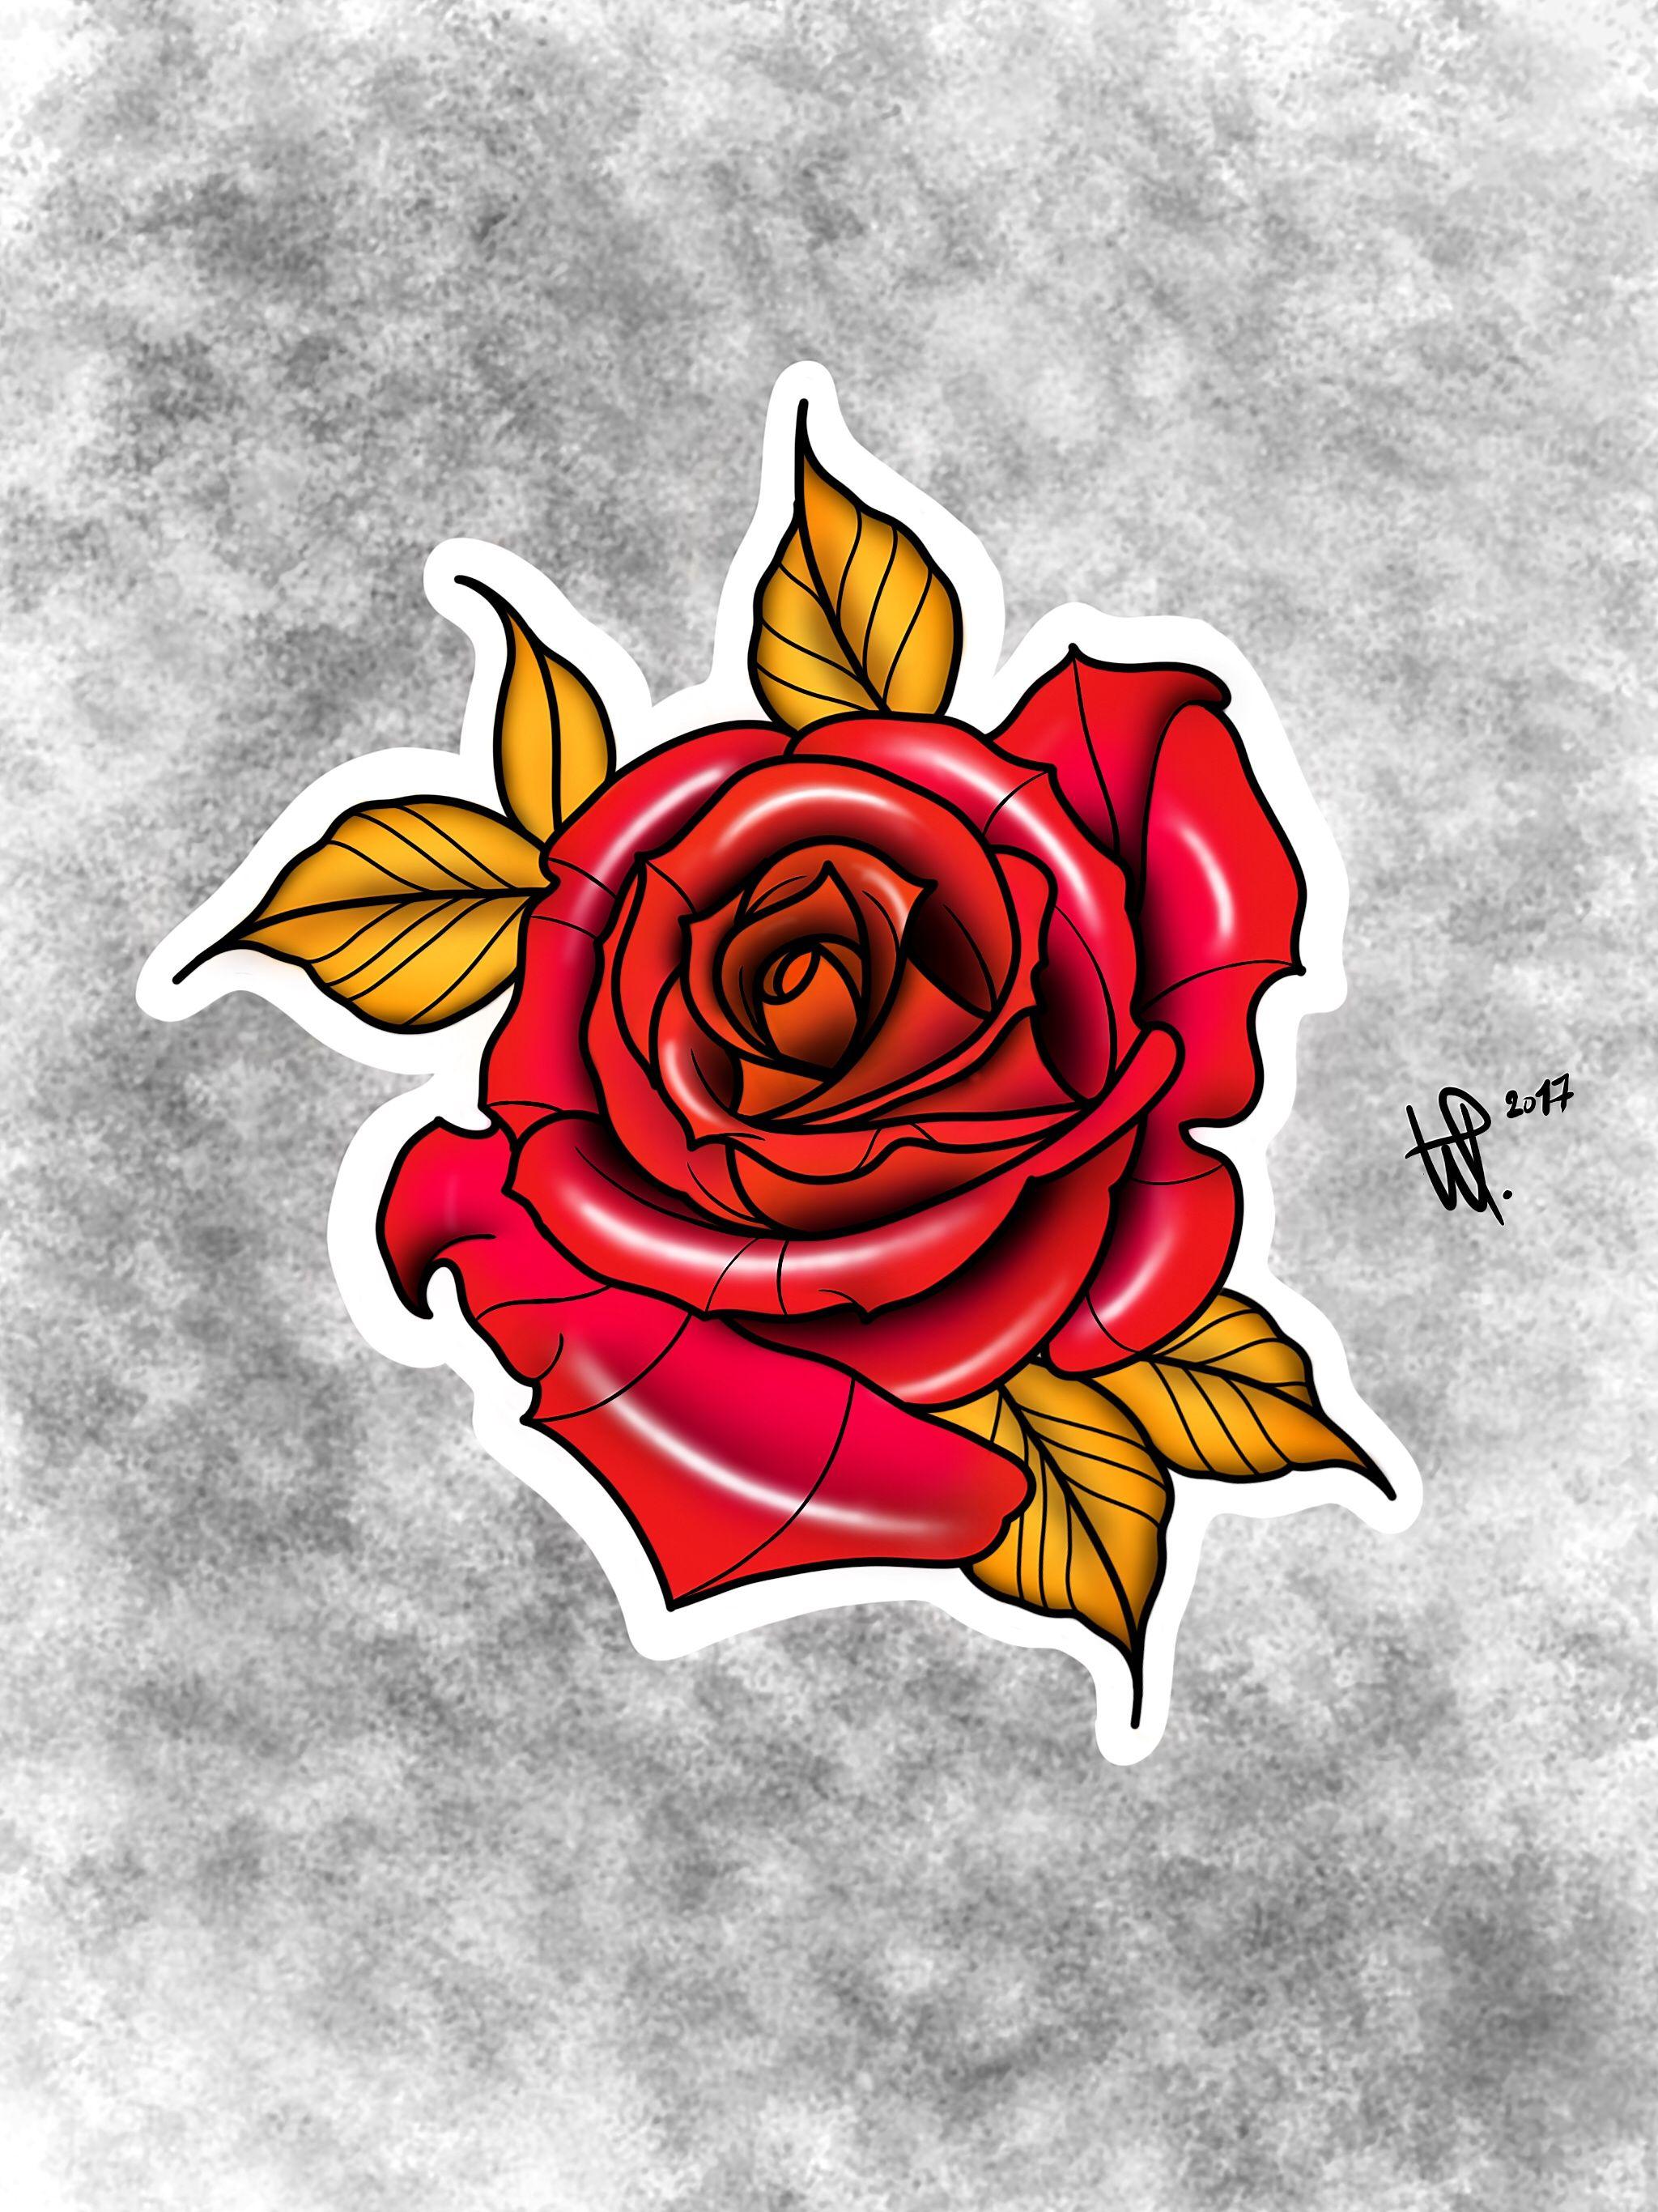 Drawed by PLWY. tattoo tattoos rose rosetattoo